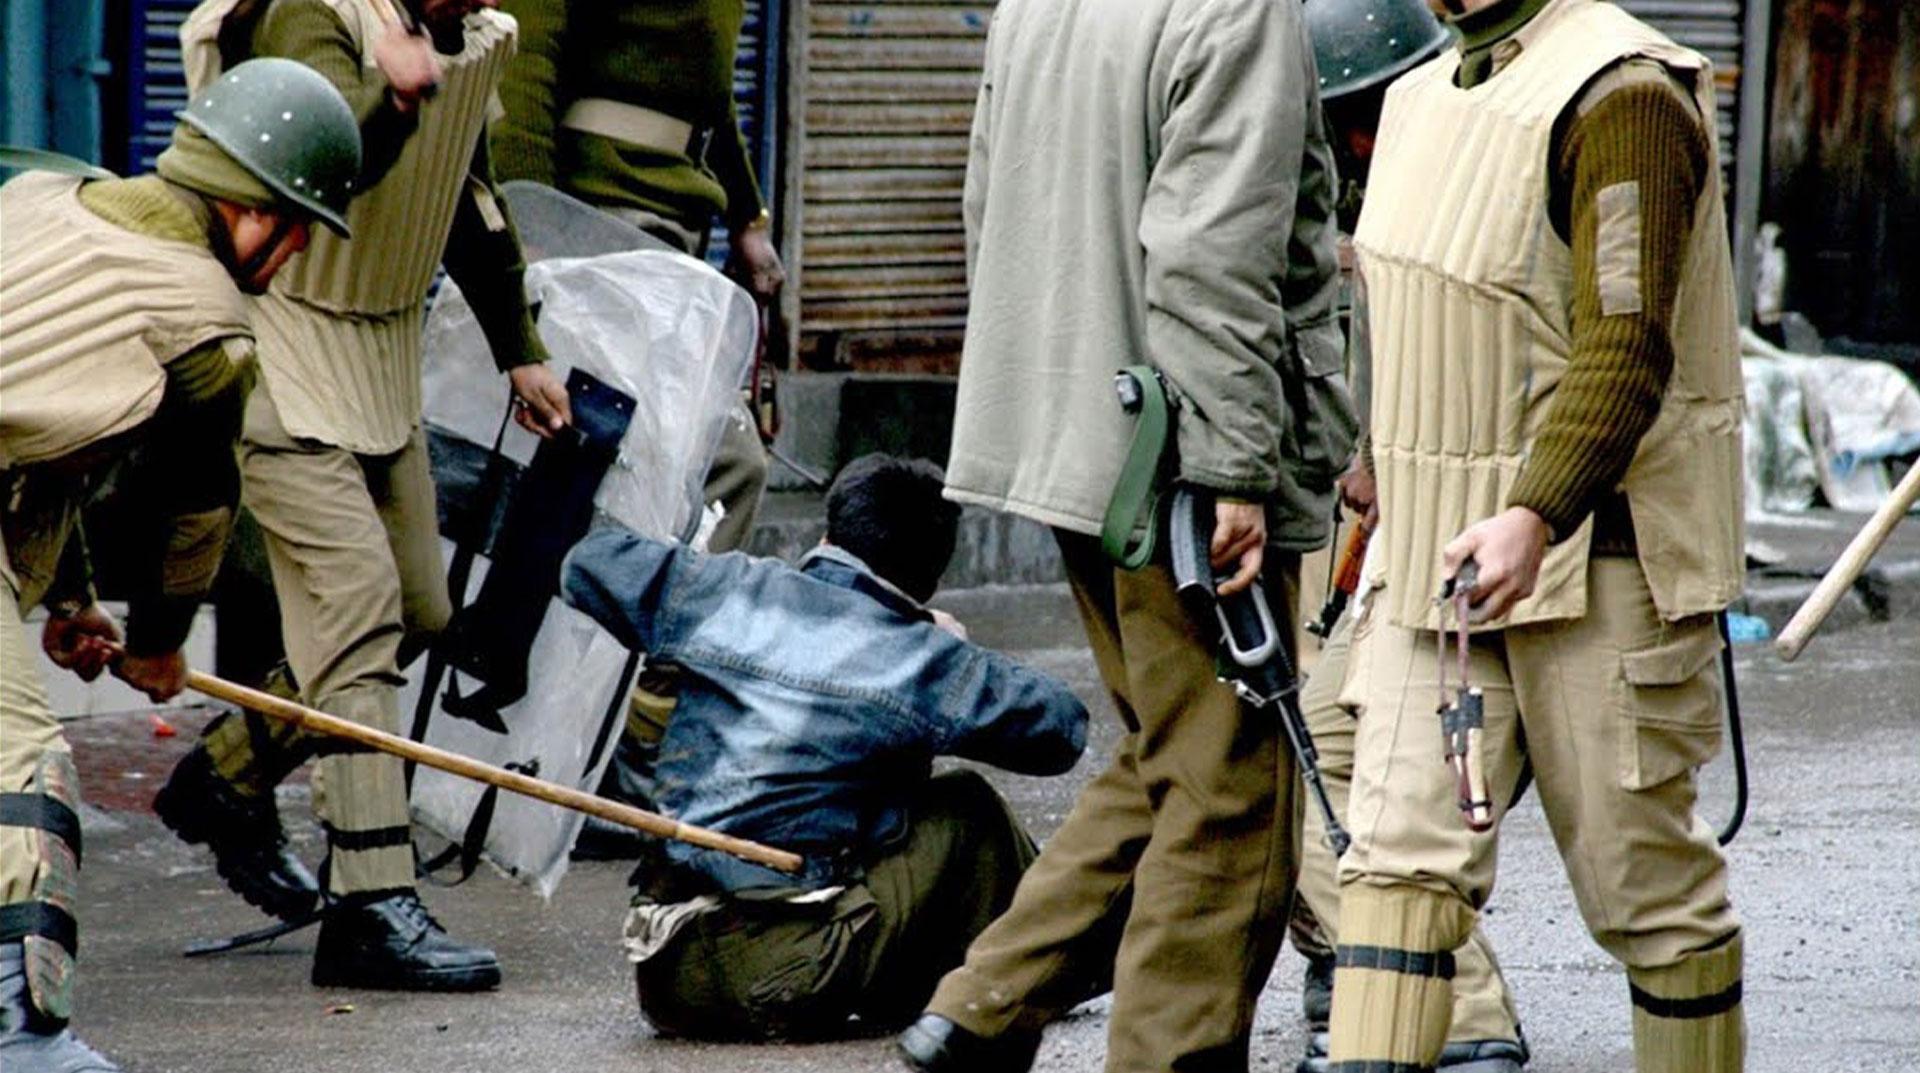 Hindistan'ın Tahammülsüzlüğü! İşgaline Tepki Verenden Rahatsız!